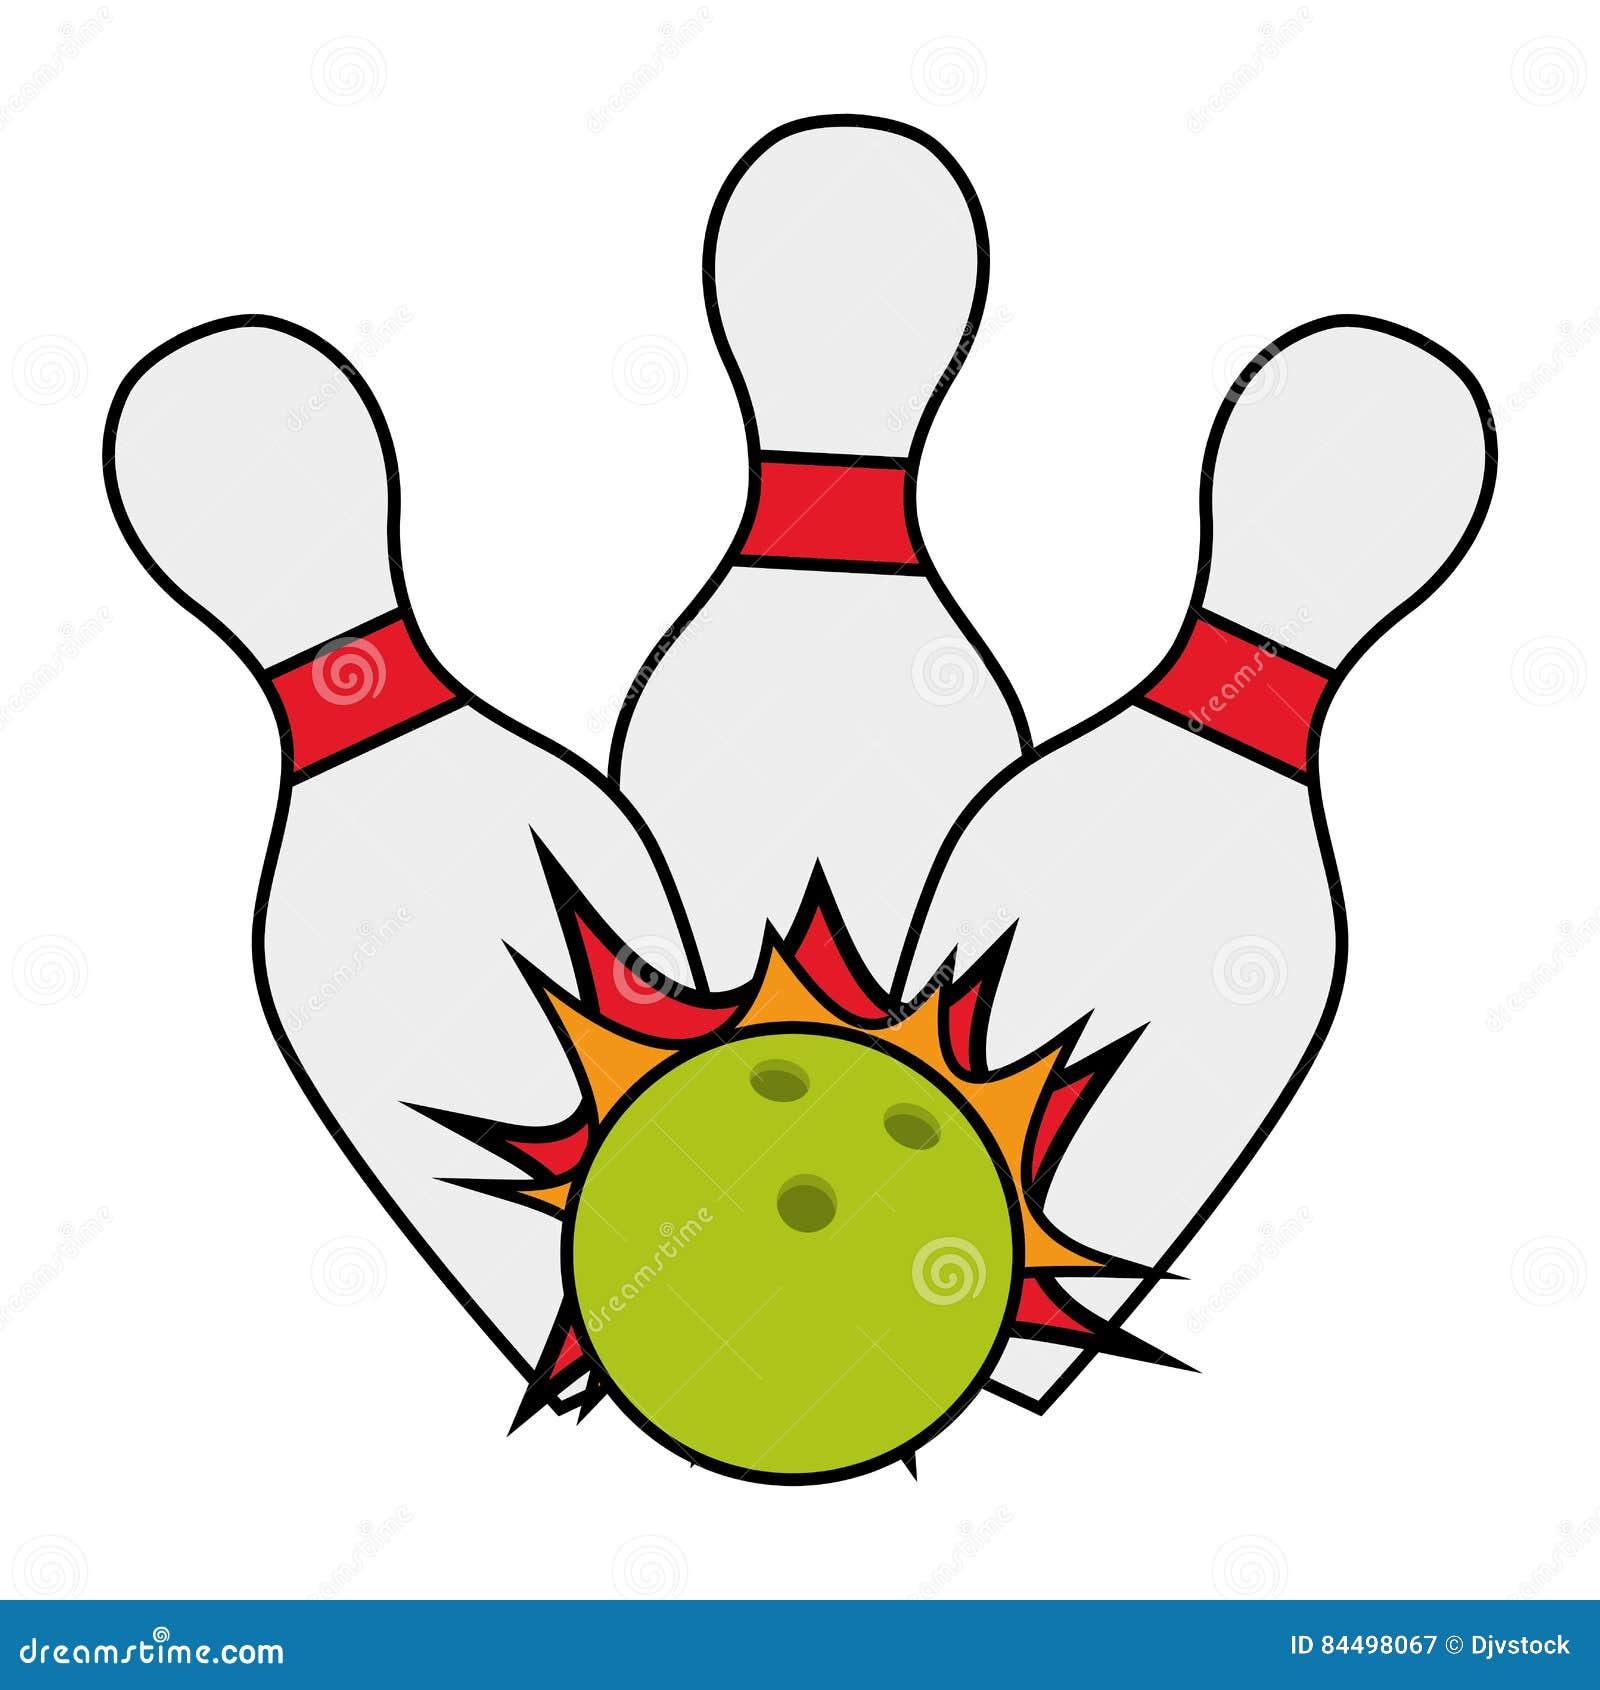 Bowling Ball Pin Strike Cartoon Stock Illustration Illustration Of Object Recreation 84498067 A chameleon king green lizard cartoon character wearing a crown illustration. dreamstime com